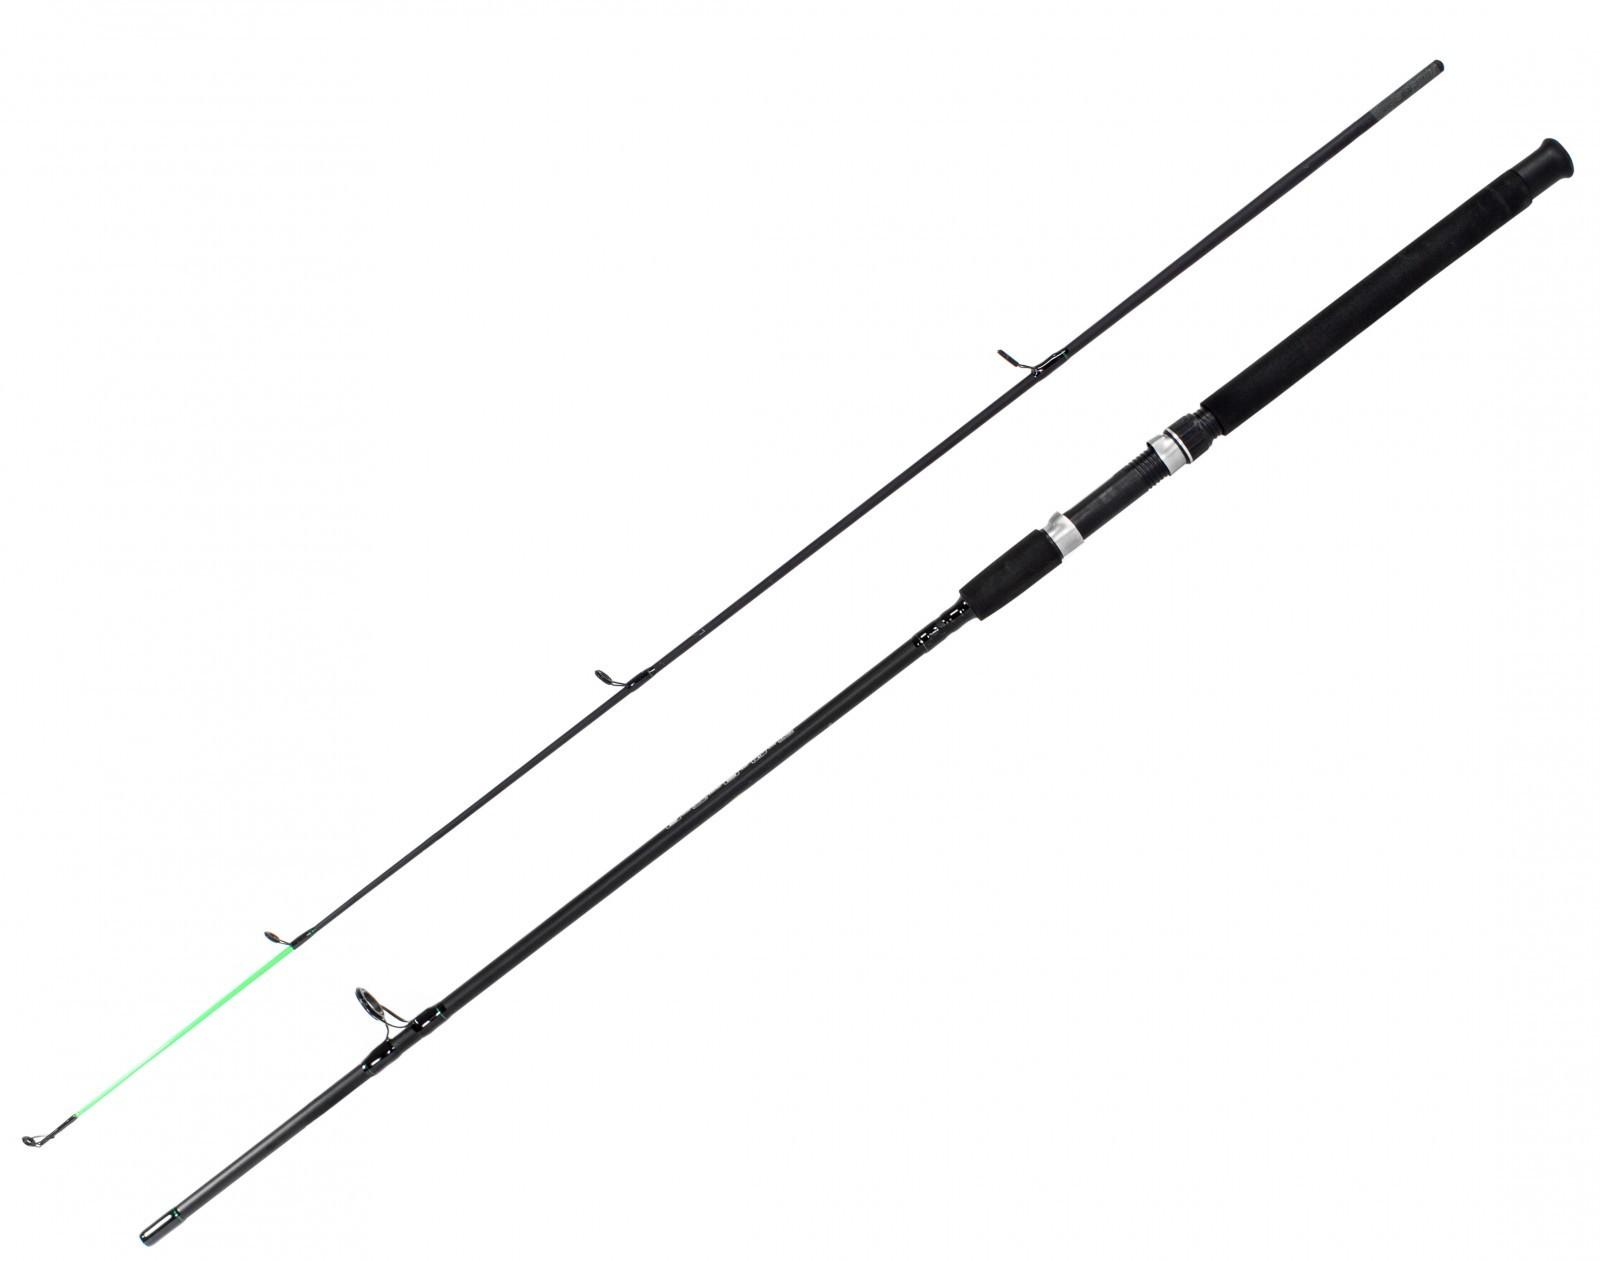 Cпиннинг штек. Mifine Assault 1.8 м / 10-40г / арт 1106-180